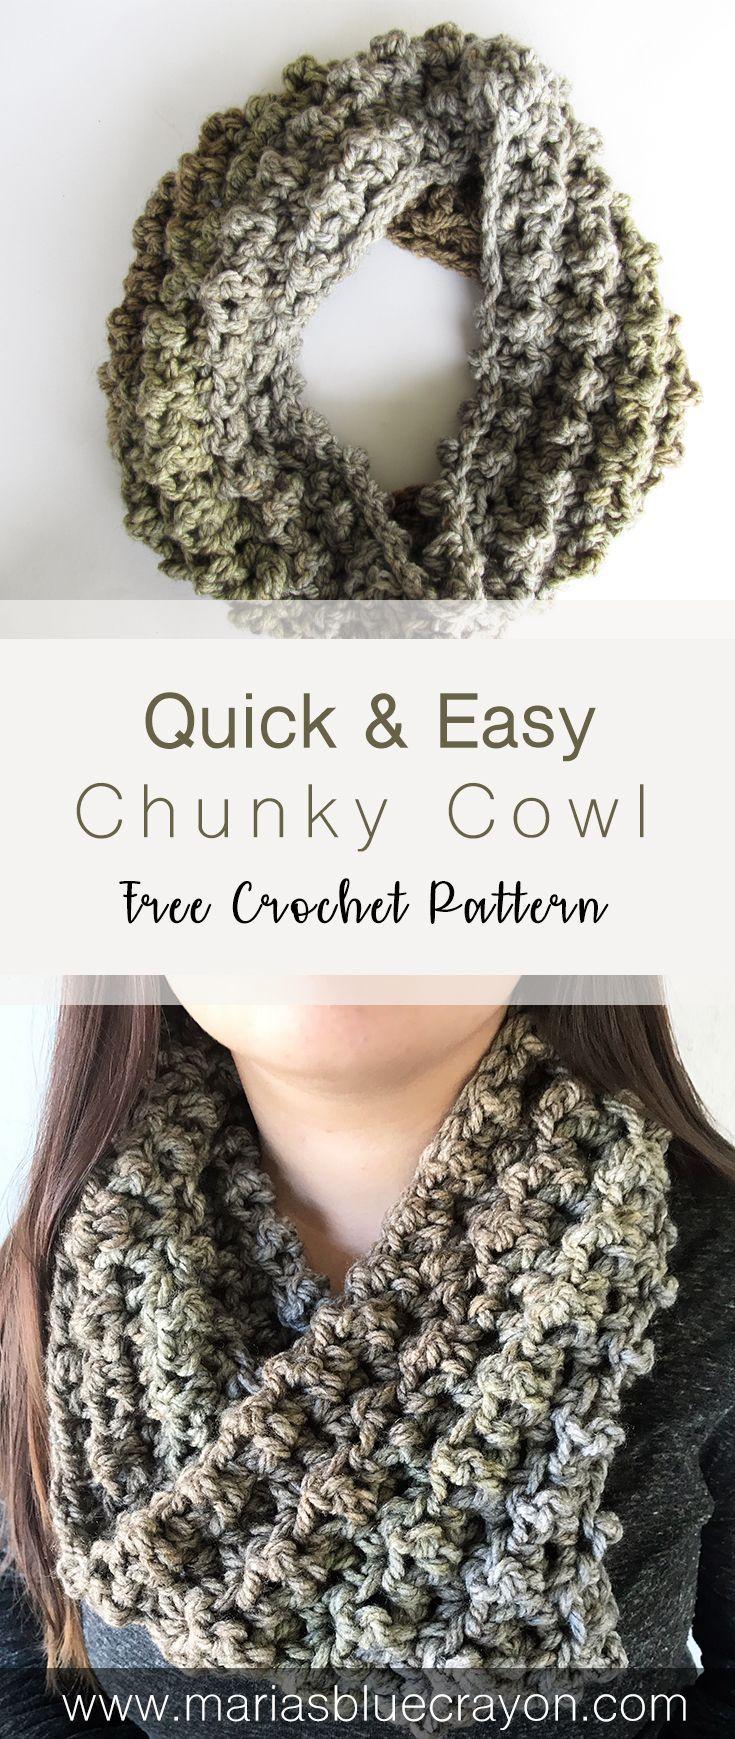 Easy & Quick Crochet Chunky Cowl | Free Crochet Pattern | Beginner ...